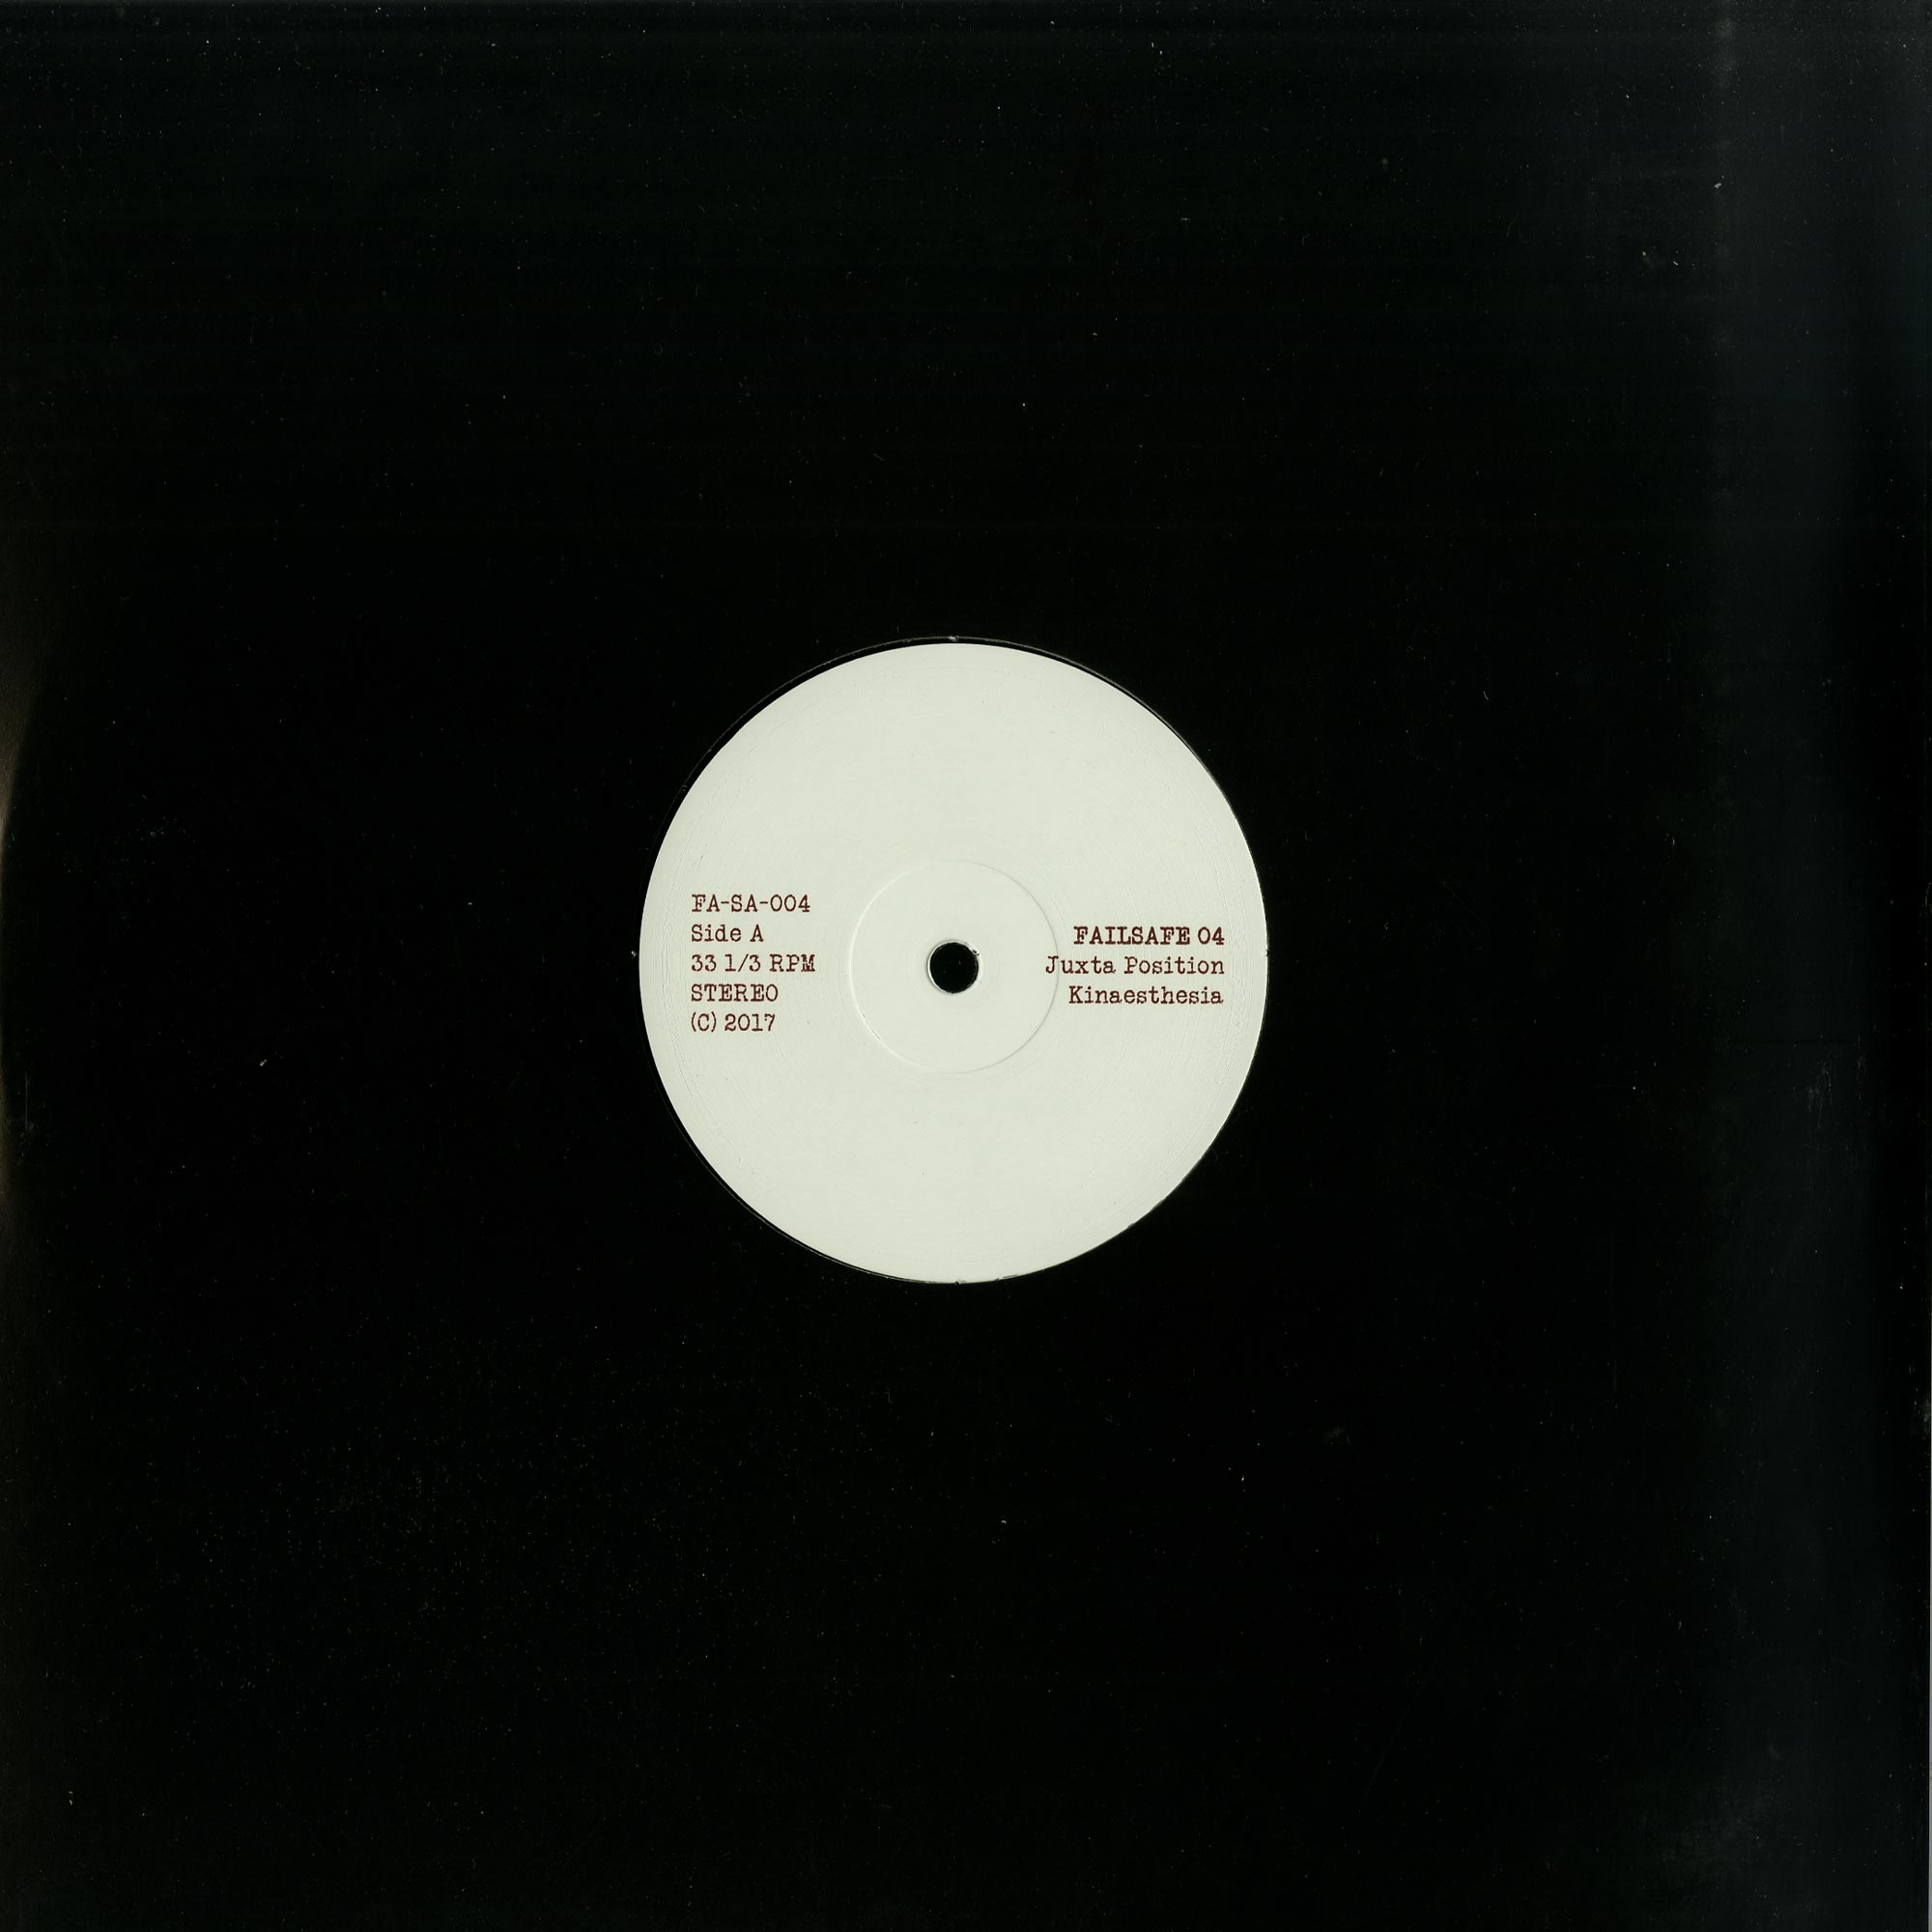 Juxta Position - FAILSAFE04